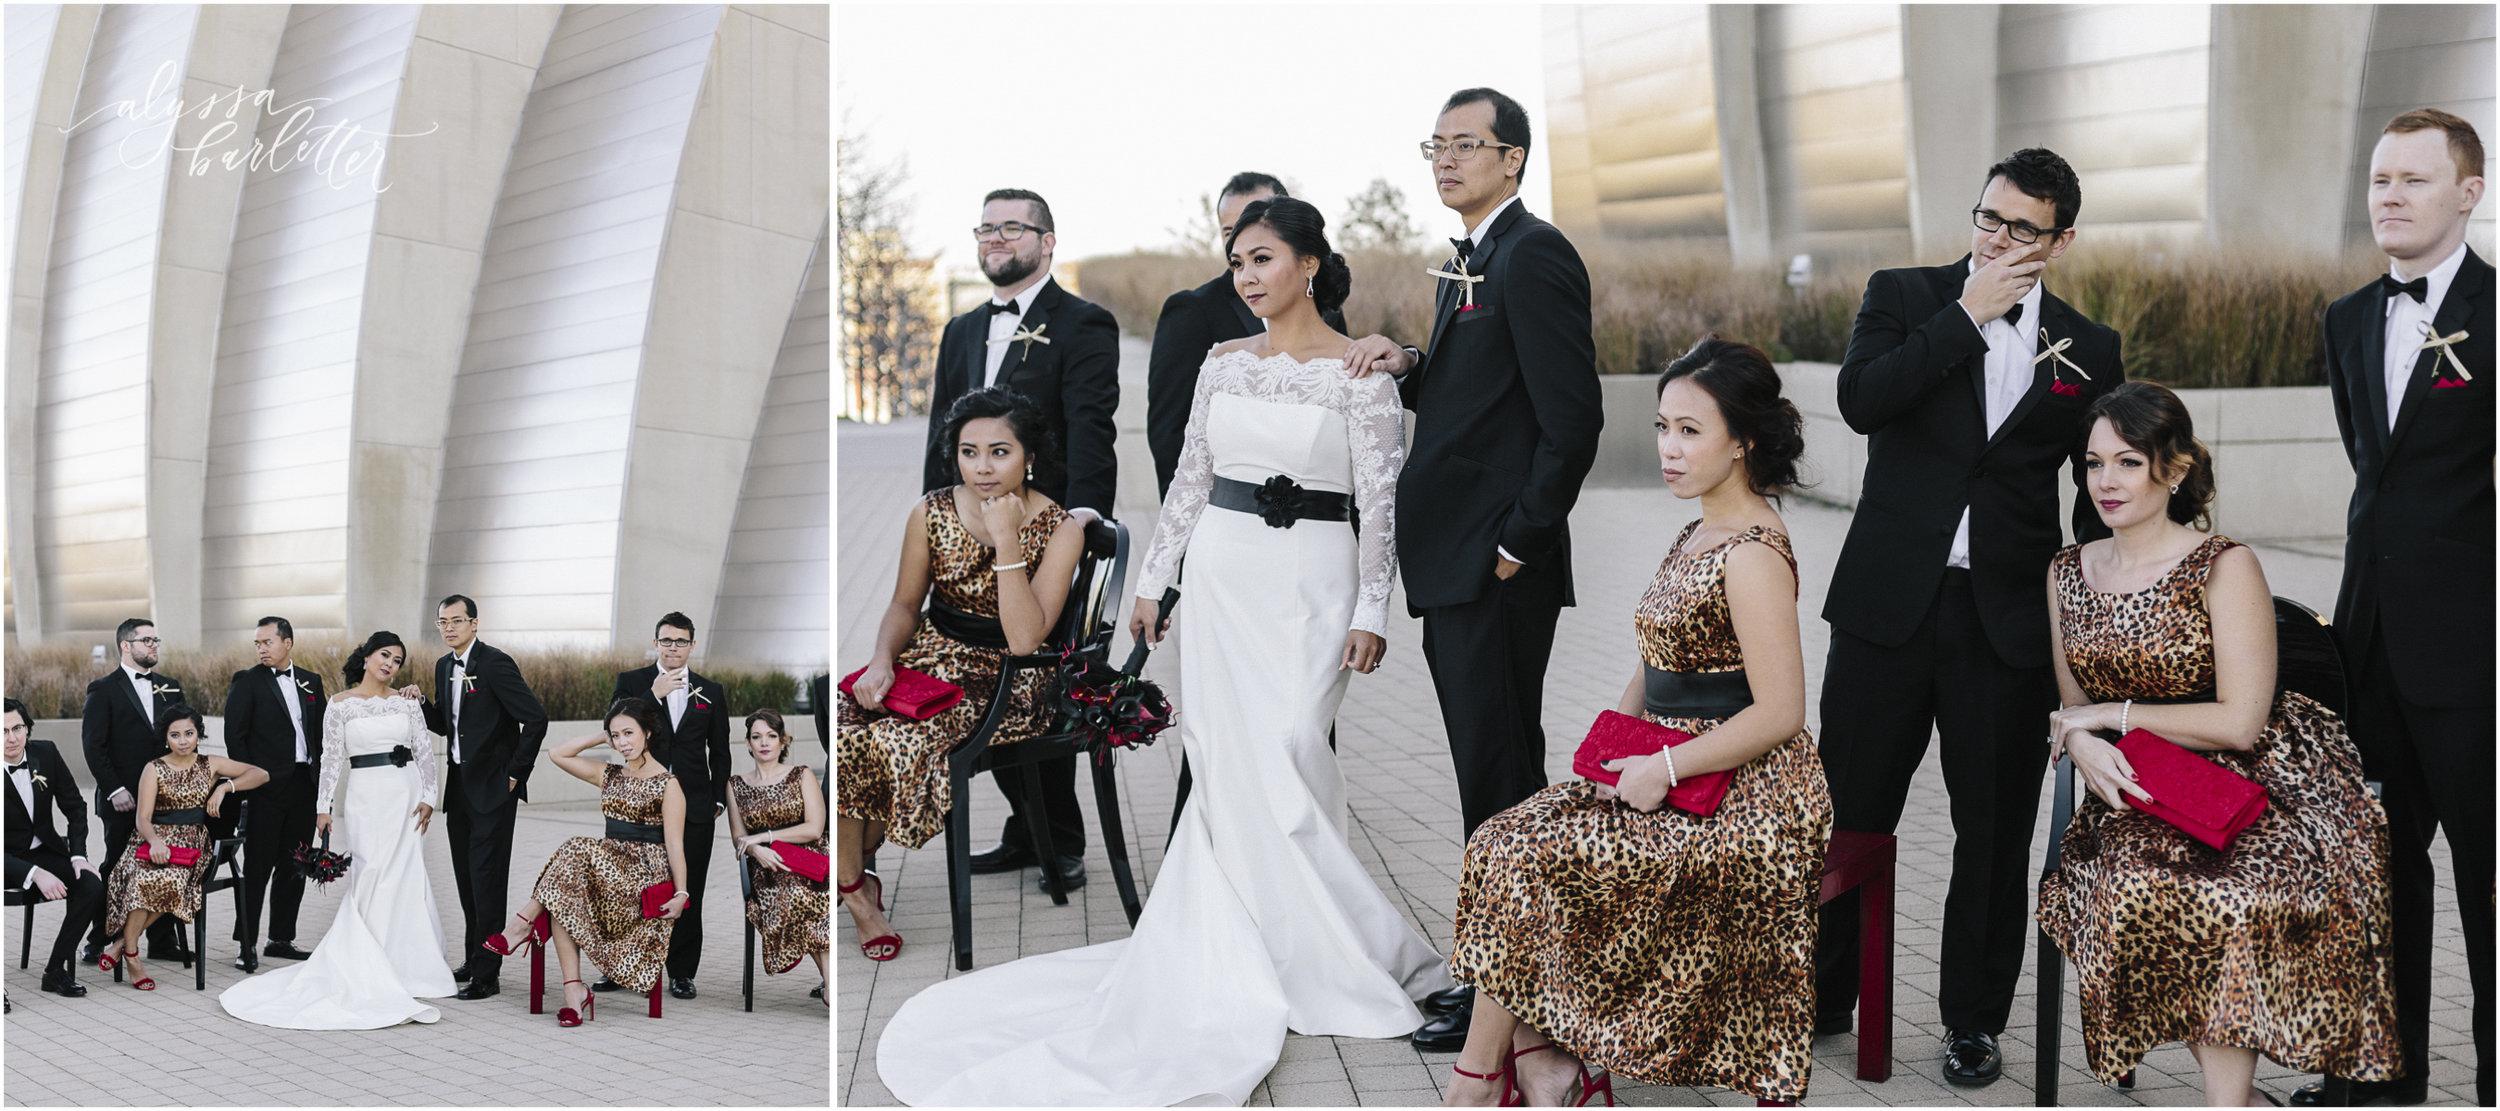 alyssa barletter photography union station wedding photos leopard print winter wedding-1-25.jpg